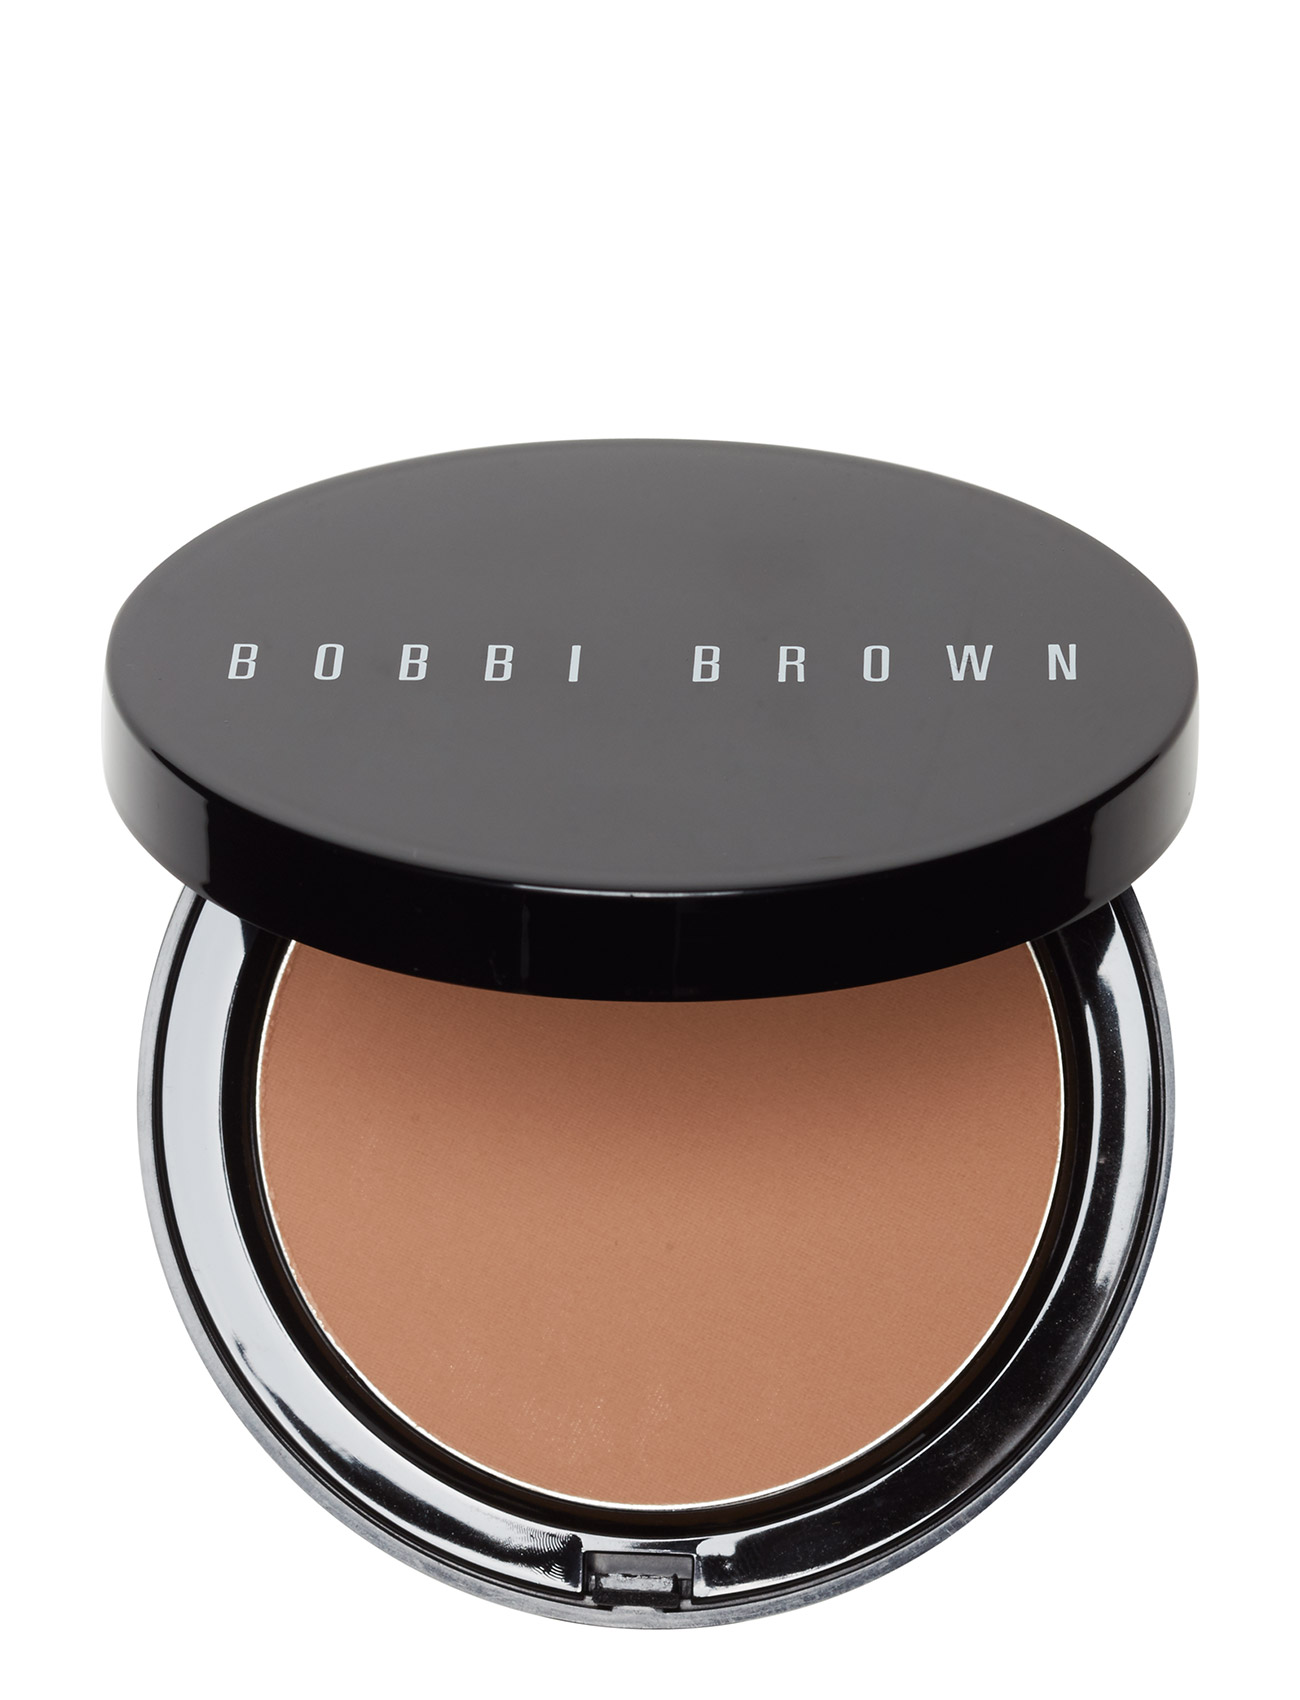 bobbi brown Bronzing powder, medium fra boozt.com dk